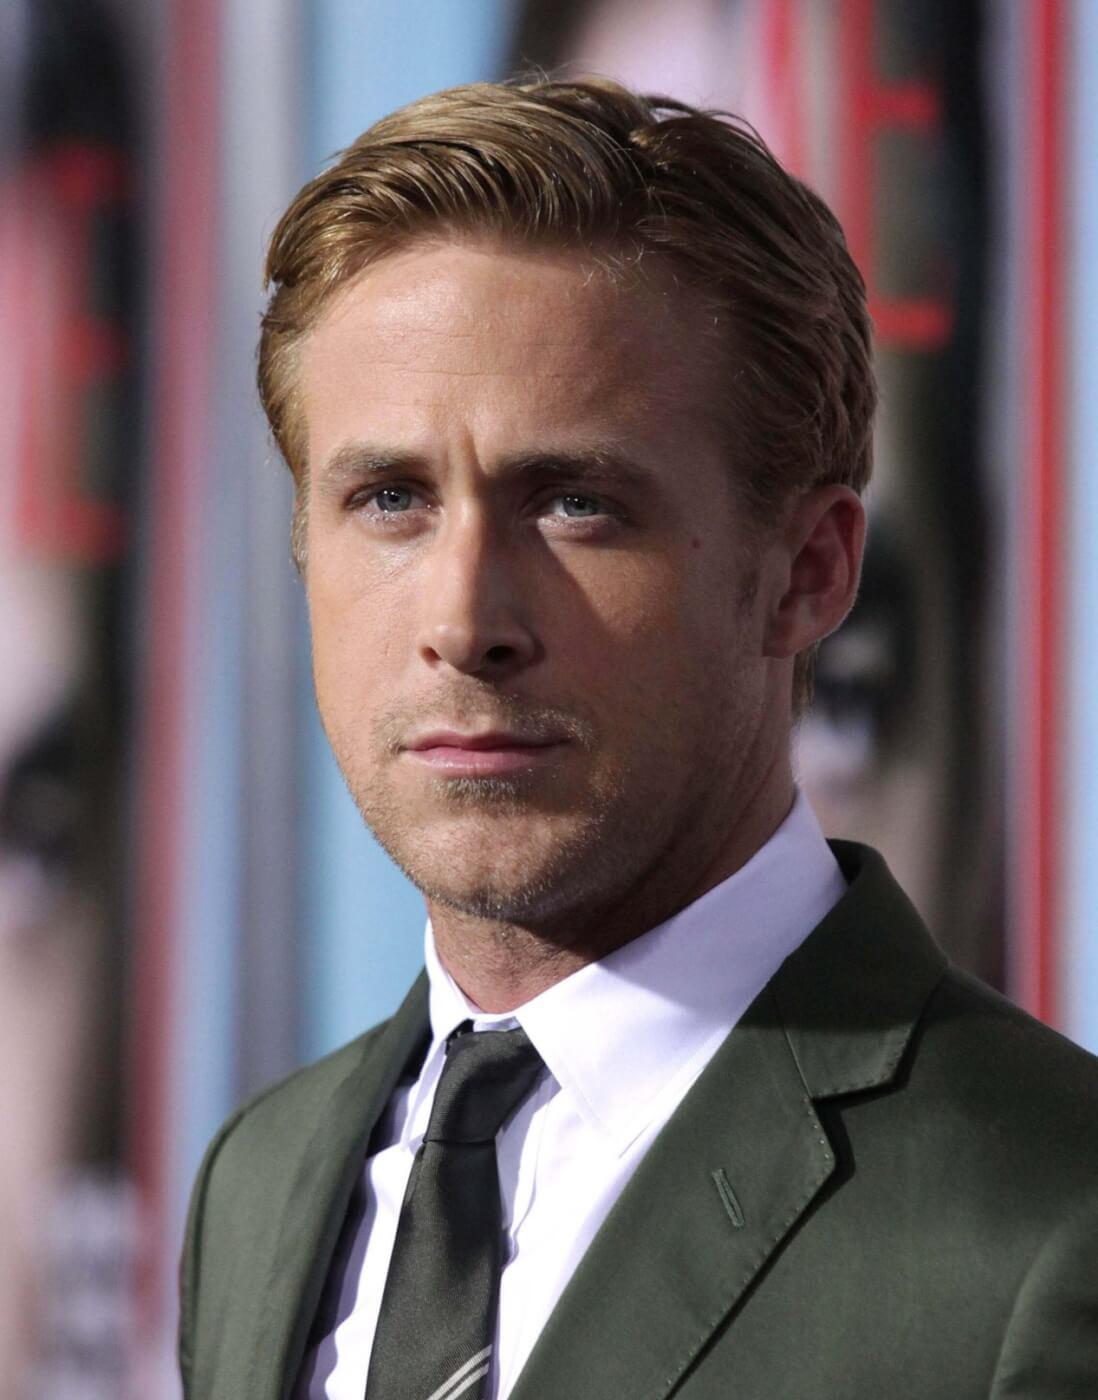 Ryan Gosling | Discography | Discogs